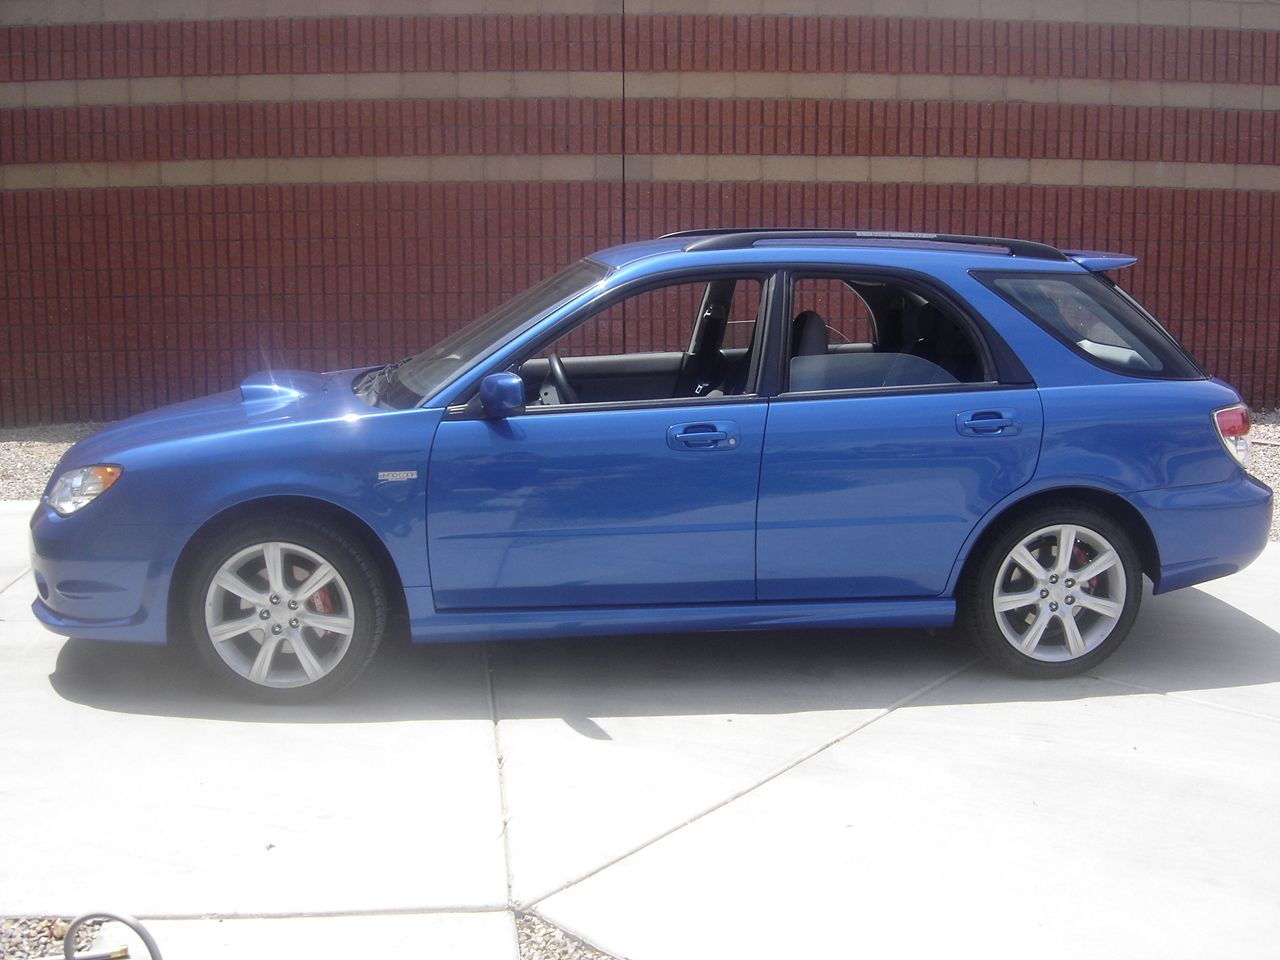 Subaru impreza wrx wagon subaru pinterest wrx wagon subaru subaru impreza wrx wagon vanachro Images